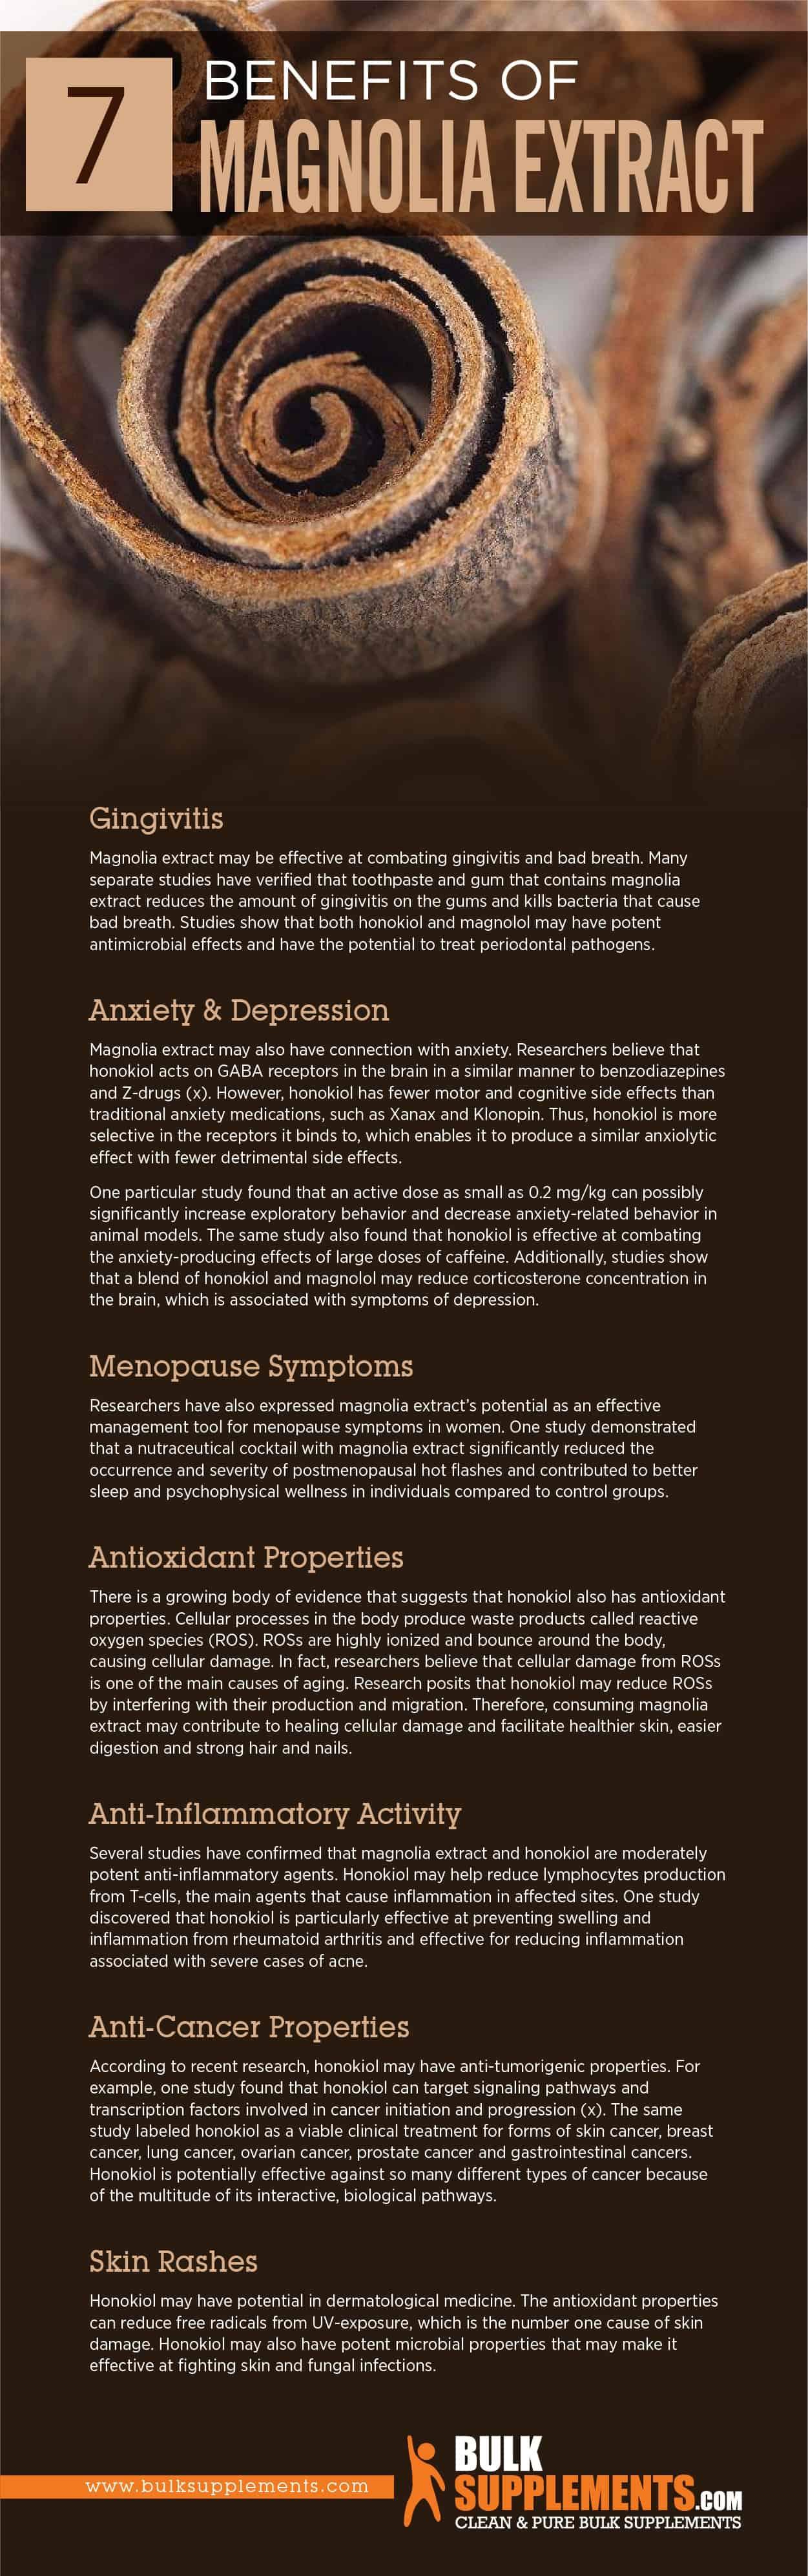 Benefits of Magnolia Extract